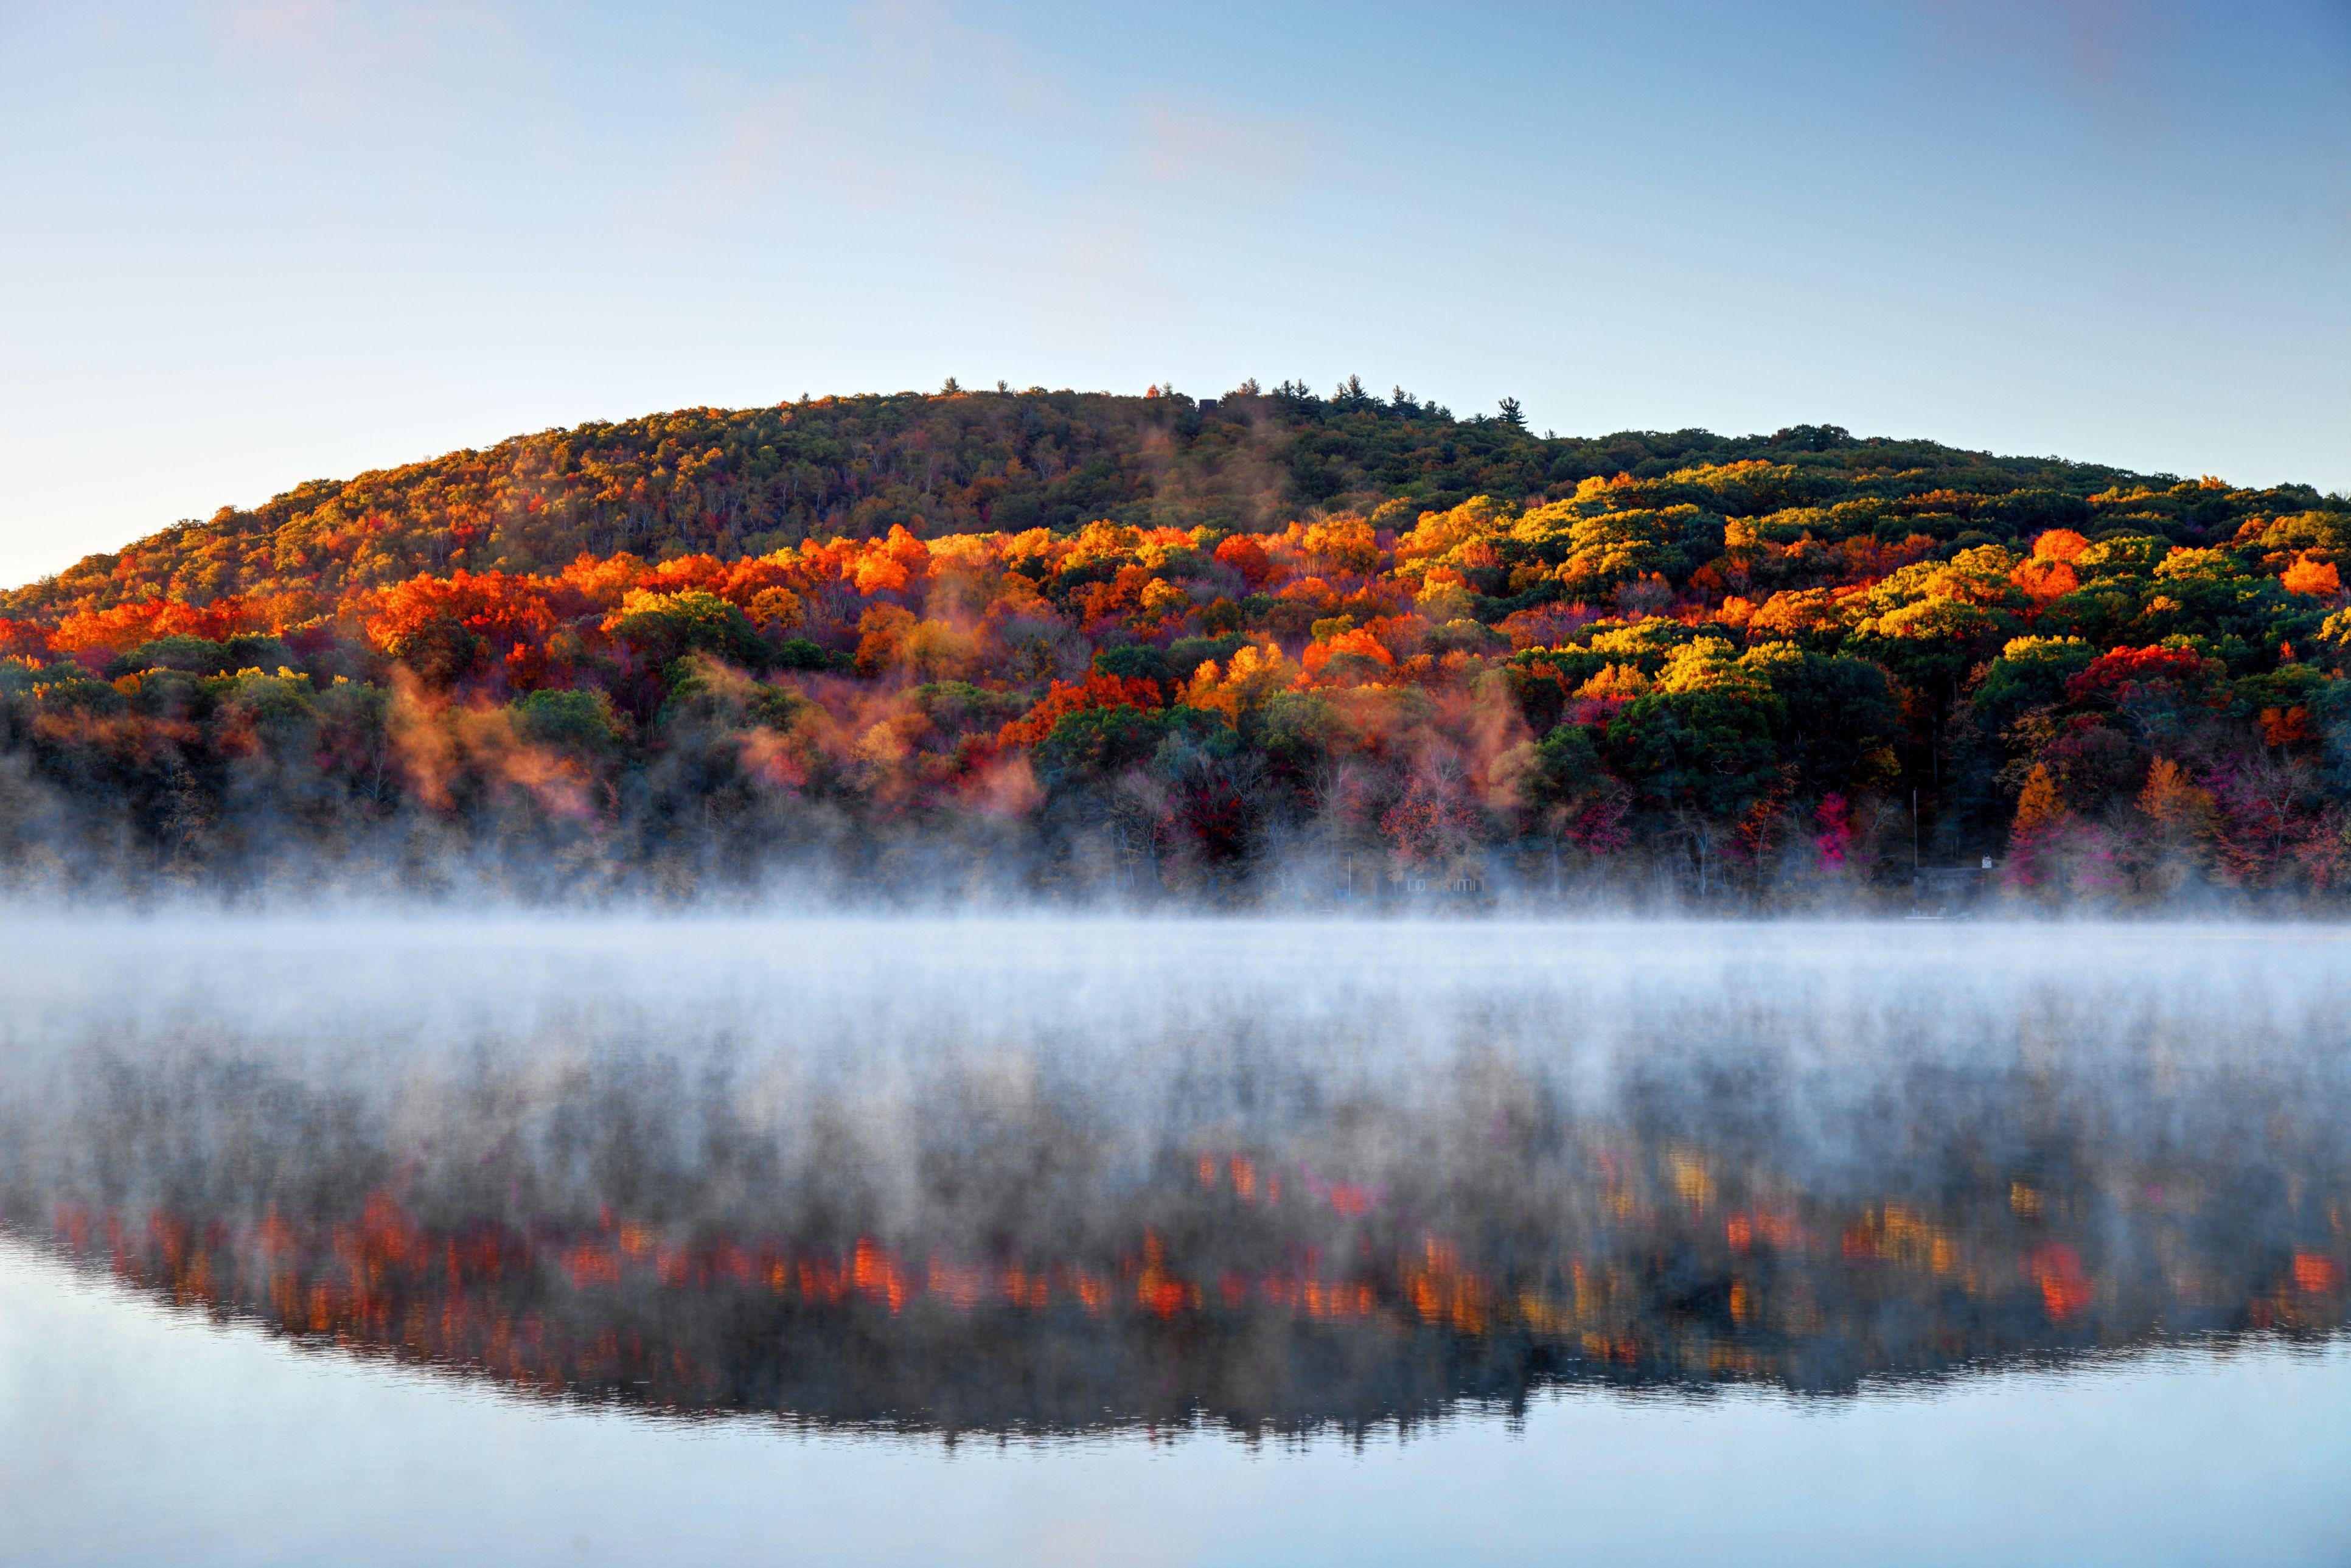 Autumn mist in the Litchfield Hills of Connecticut